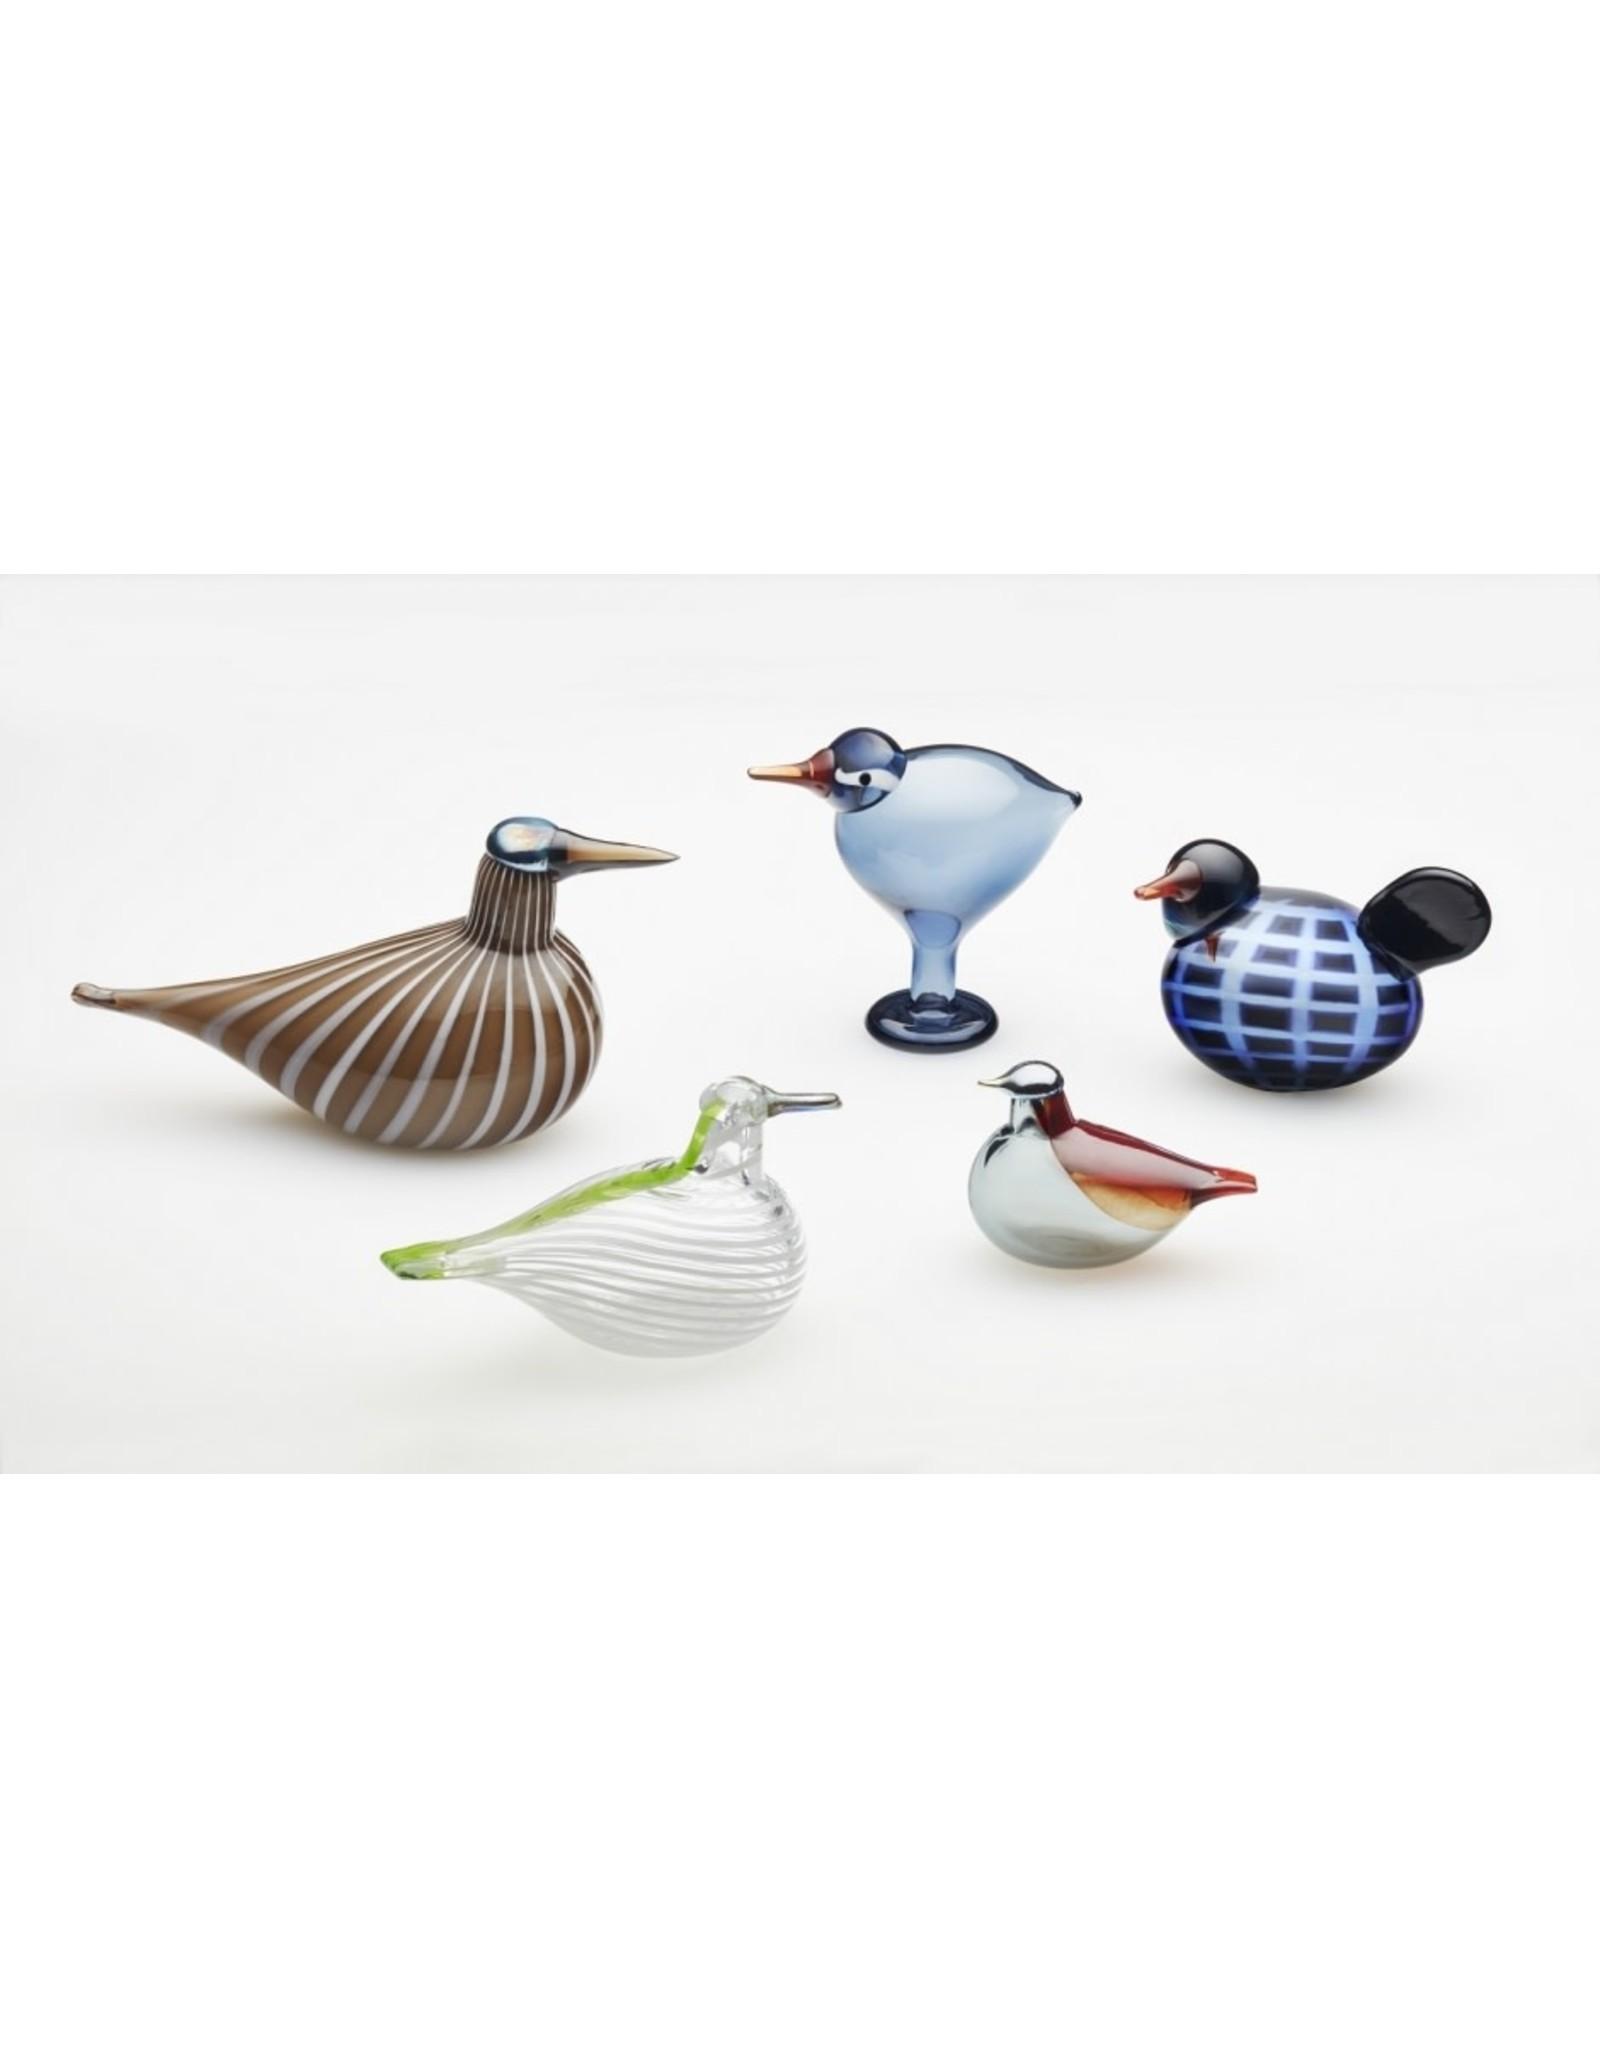 CITY BIRDS BY TOIKKA KYOTO BIRD